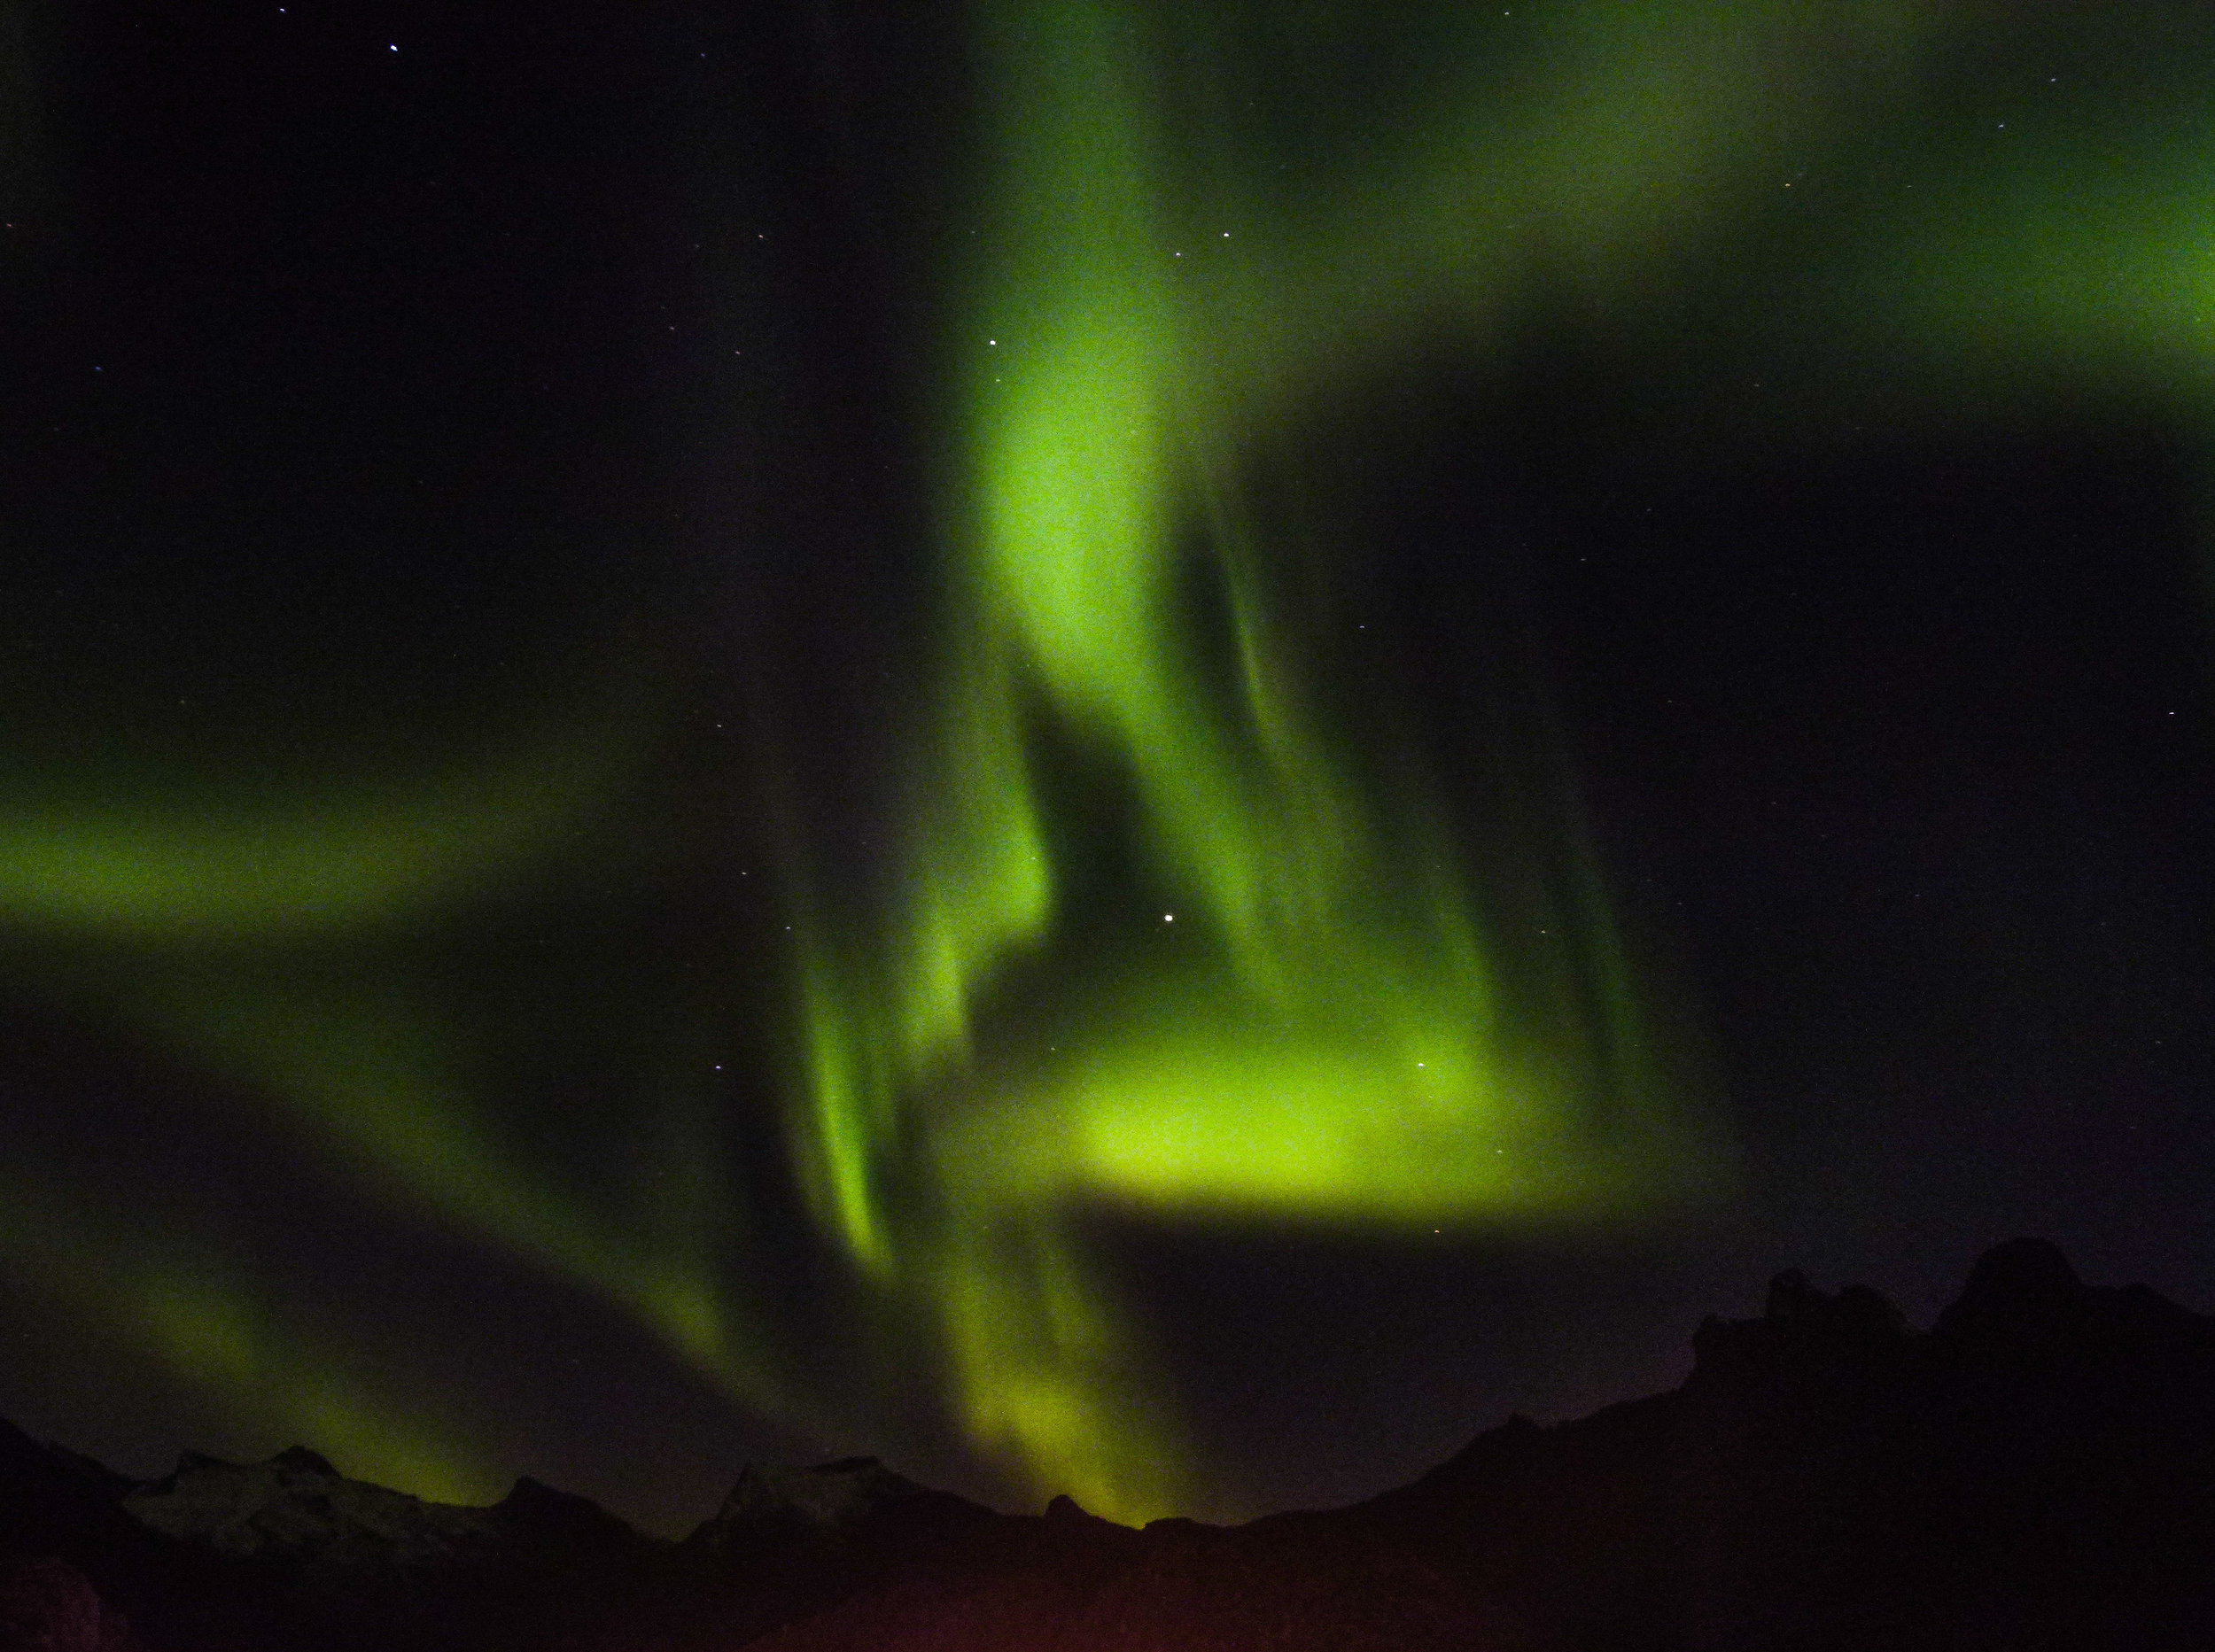 Northern Lights as seen in the Lofoten Islands